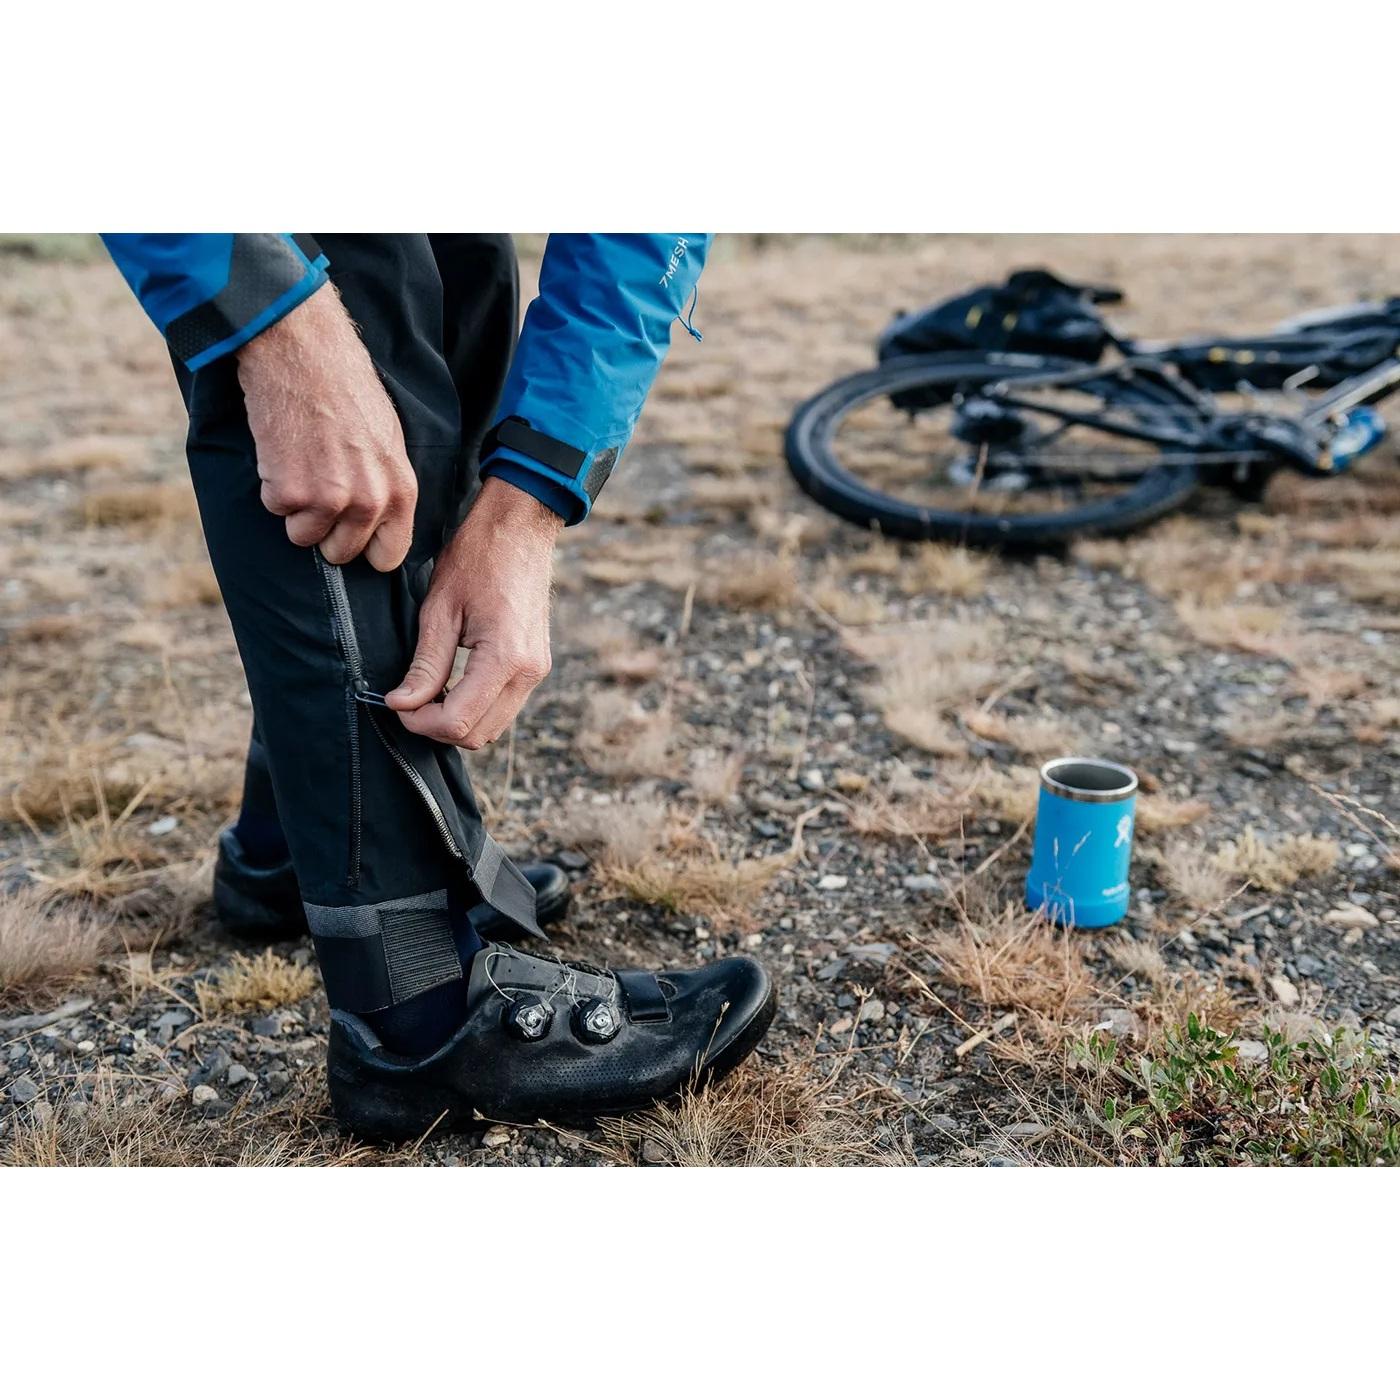 Imagen de 7mesh Thunder Pantalones de ciclismo para hombres - Black